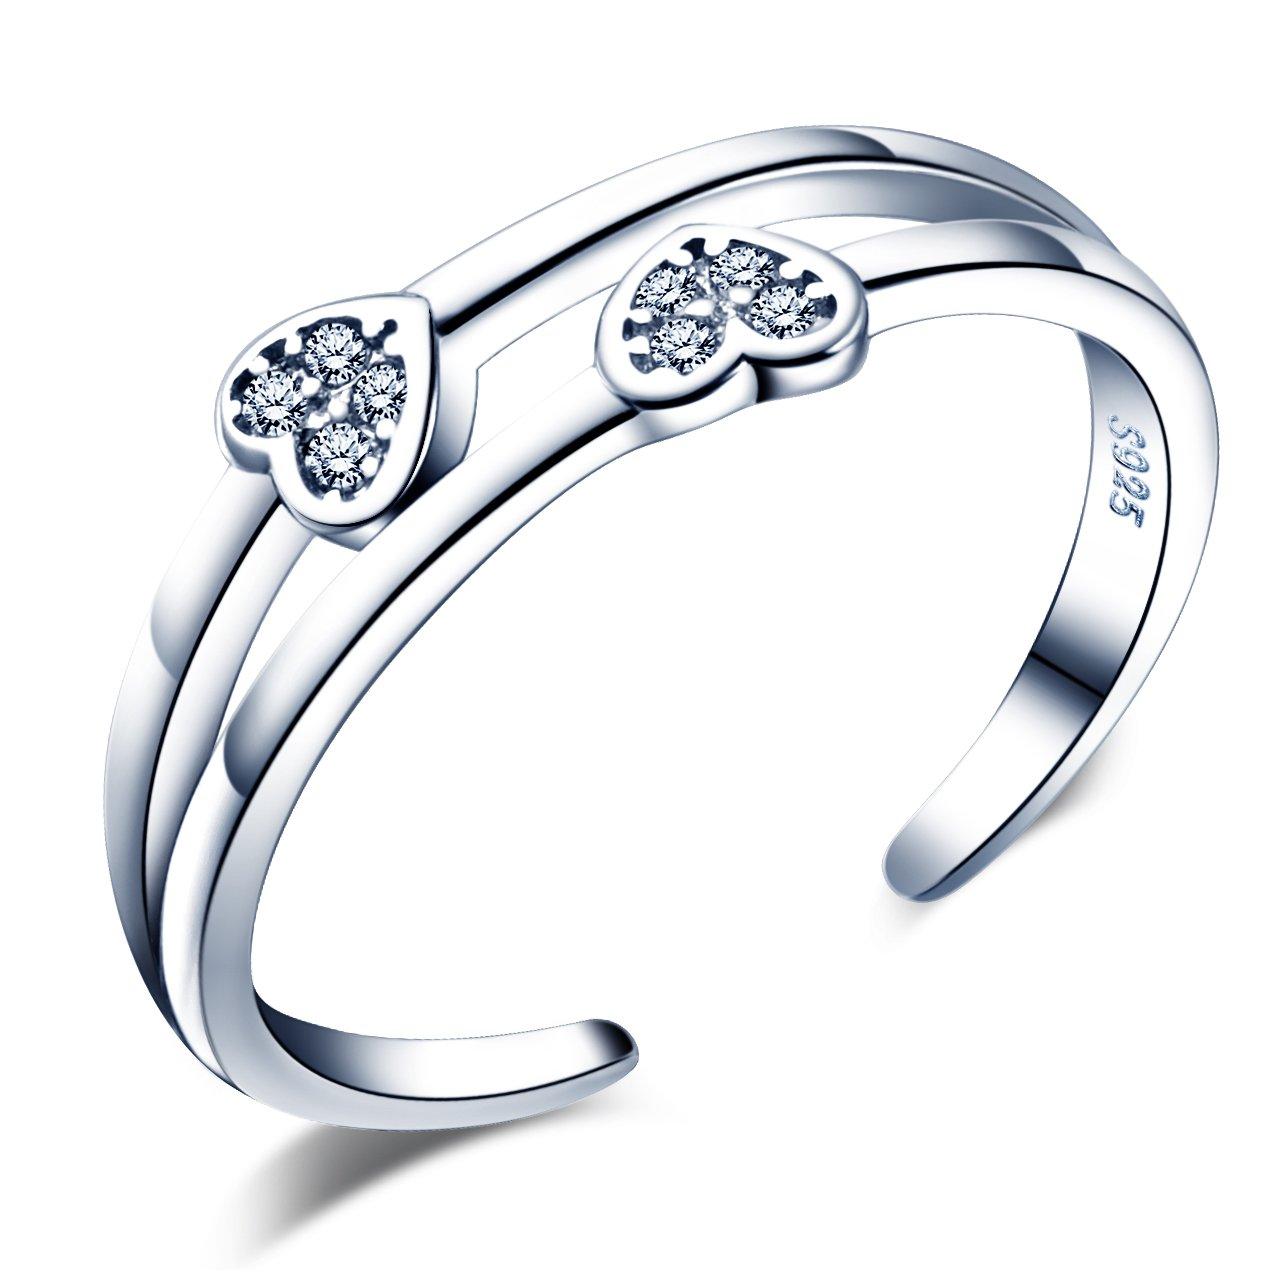 Infinite U Heart - Anillo de apertura de plata de ley 925, circonita cúbica, doble línea, para mujeres/niñas, tamaño ajustable 5 – 7 tamaño ajustable 5 - 7 Infinite Jewellery R5311